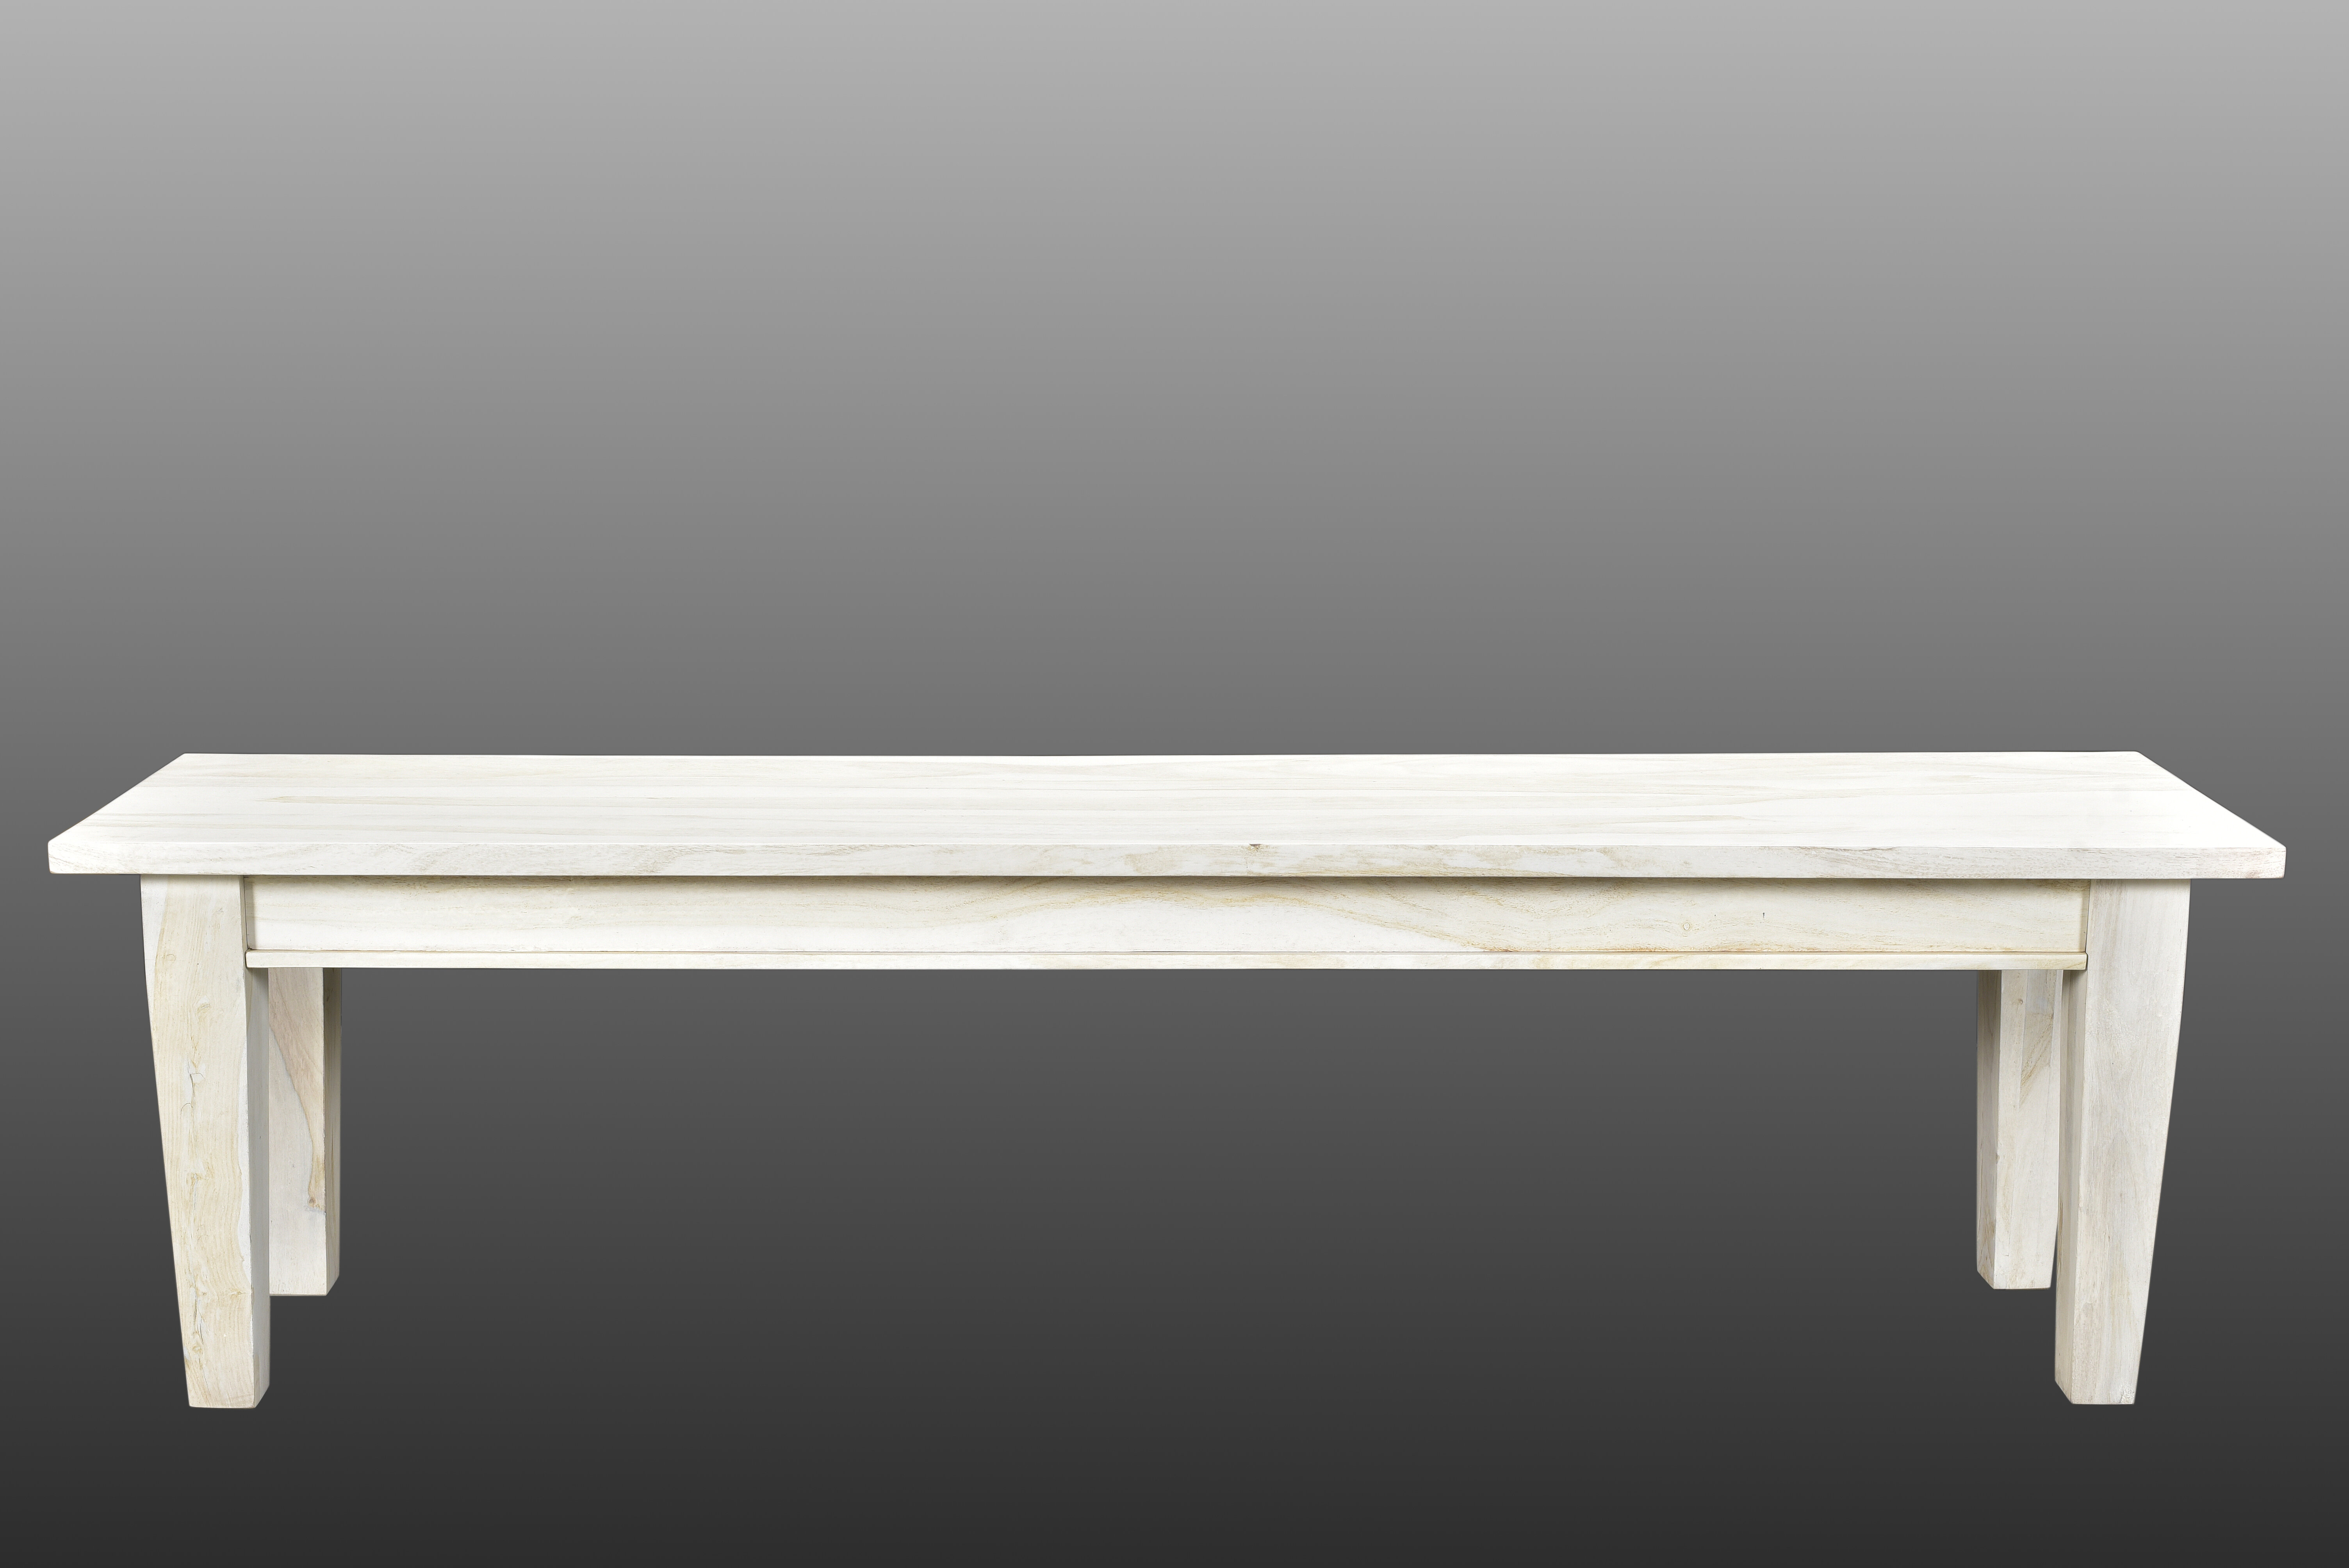 Ordinaire Union Rustic Koch Wood Bench U0026 Reviews | Wayfair